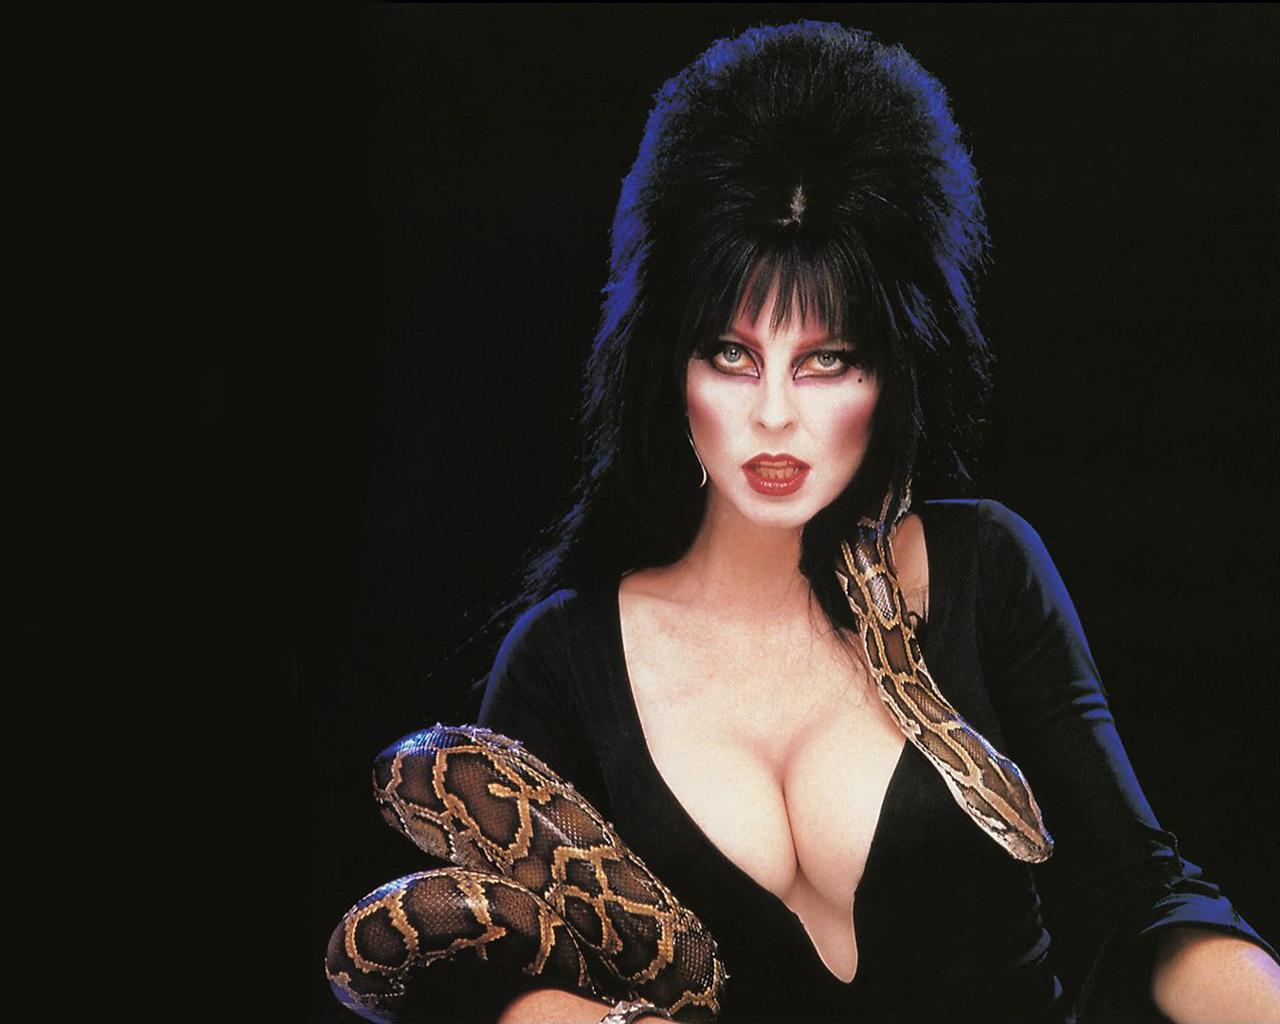 Cleavage Elvira nudes (28 photos), Tits, Bikini, Twitter, butt 2015